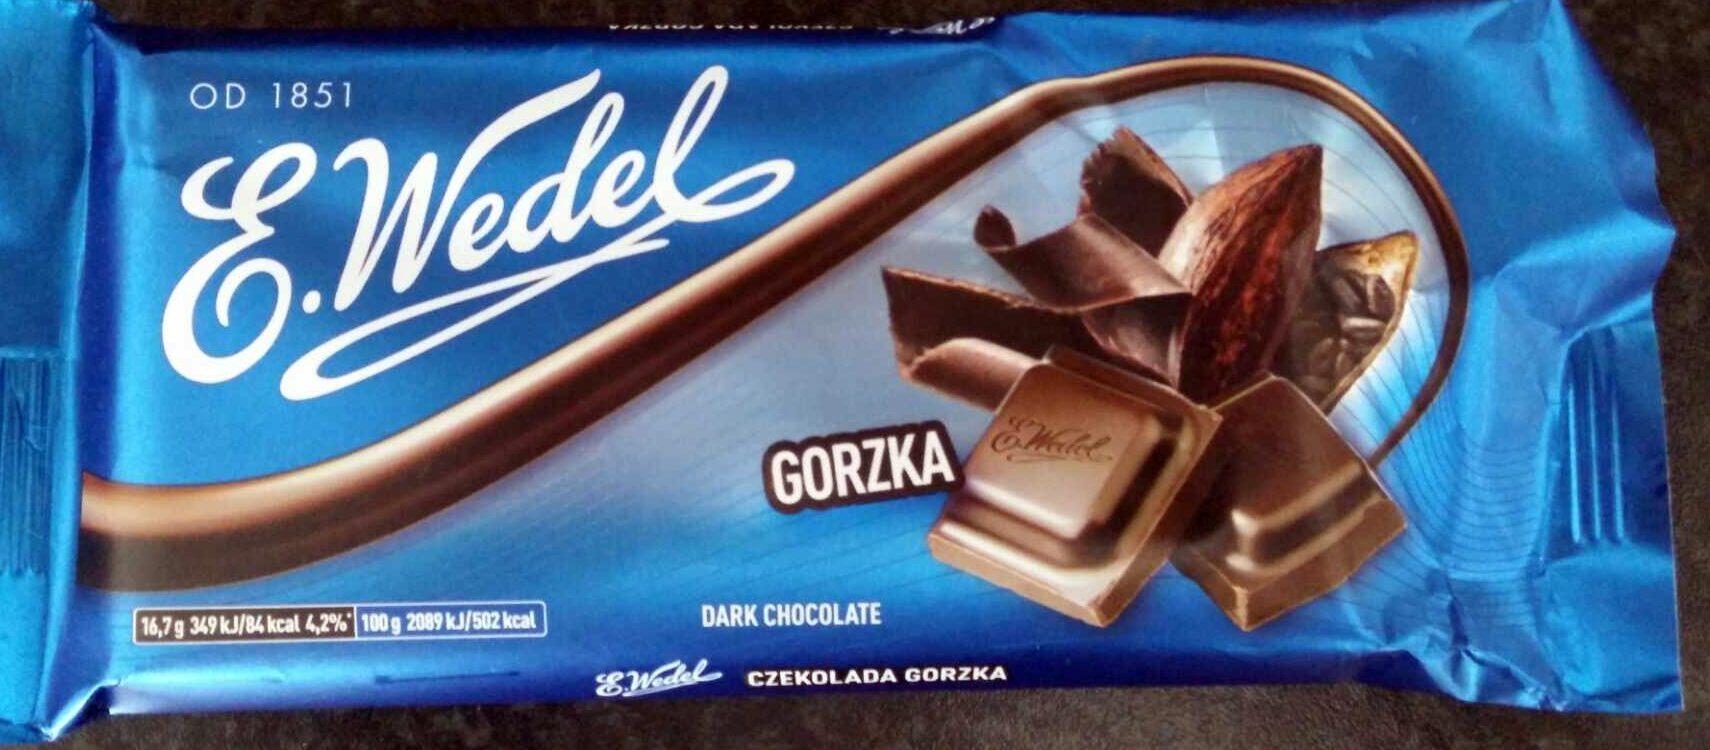 gorzka czekolada 64% - Product - pl